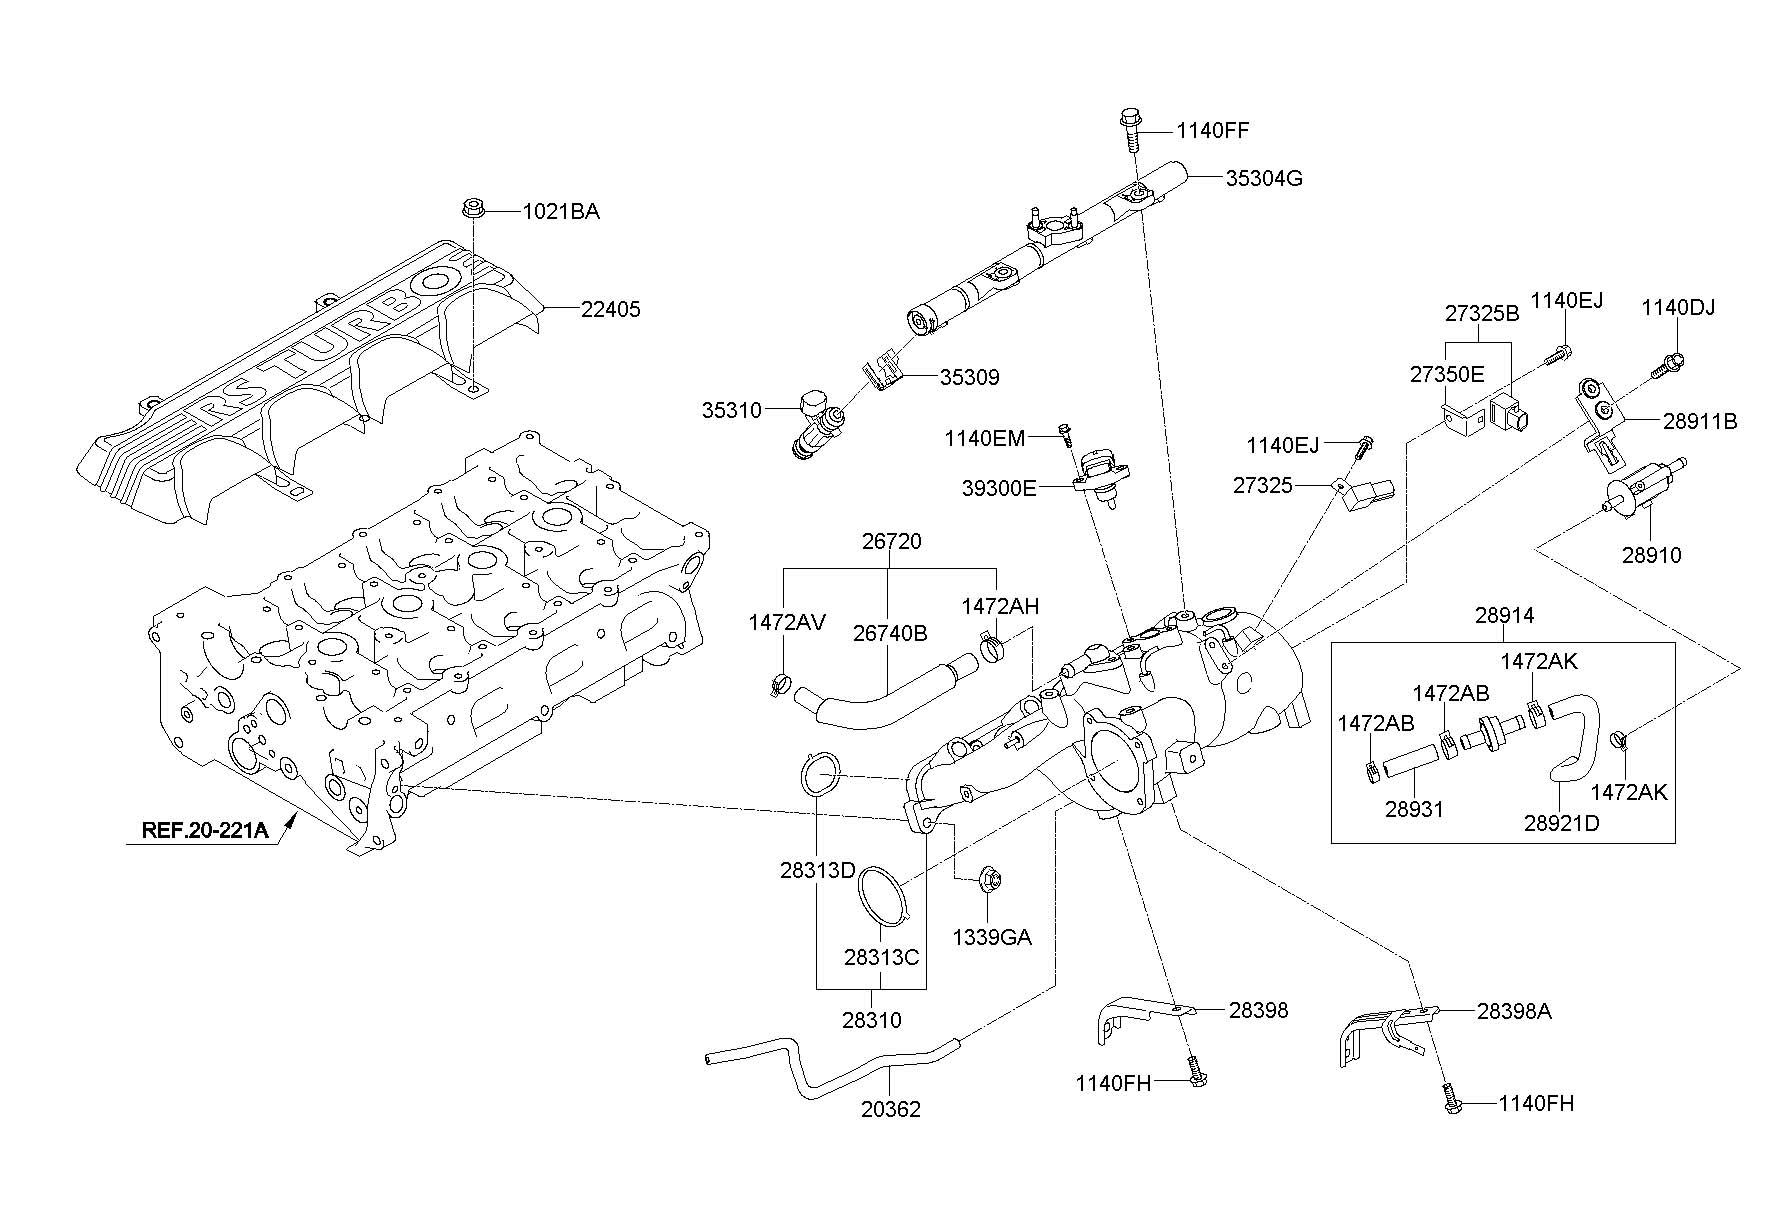 1991 chevrolet zr2 s10 fuse box diagram